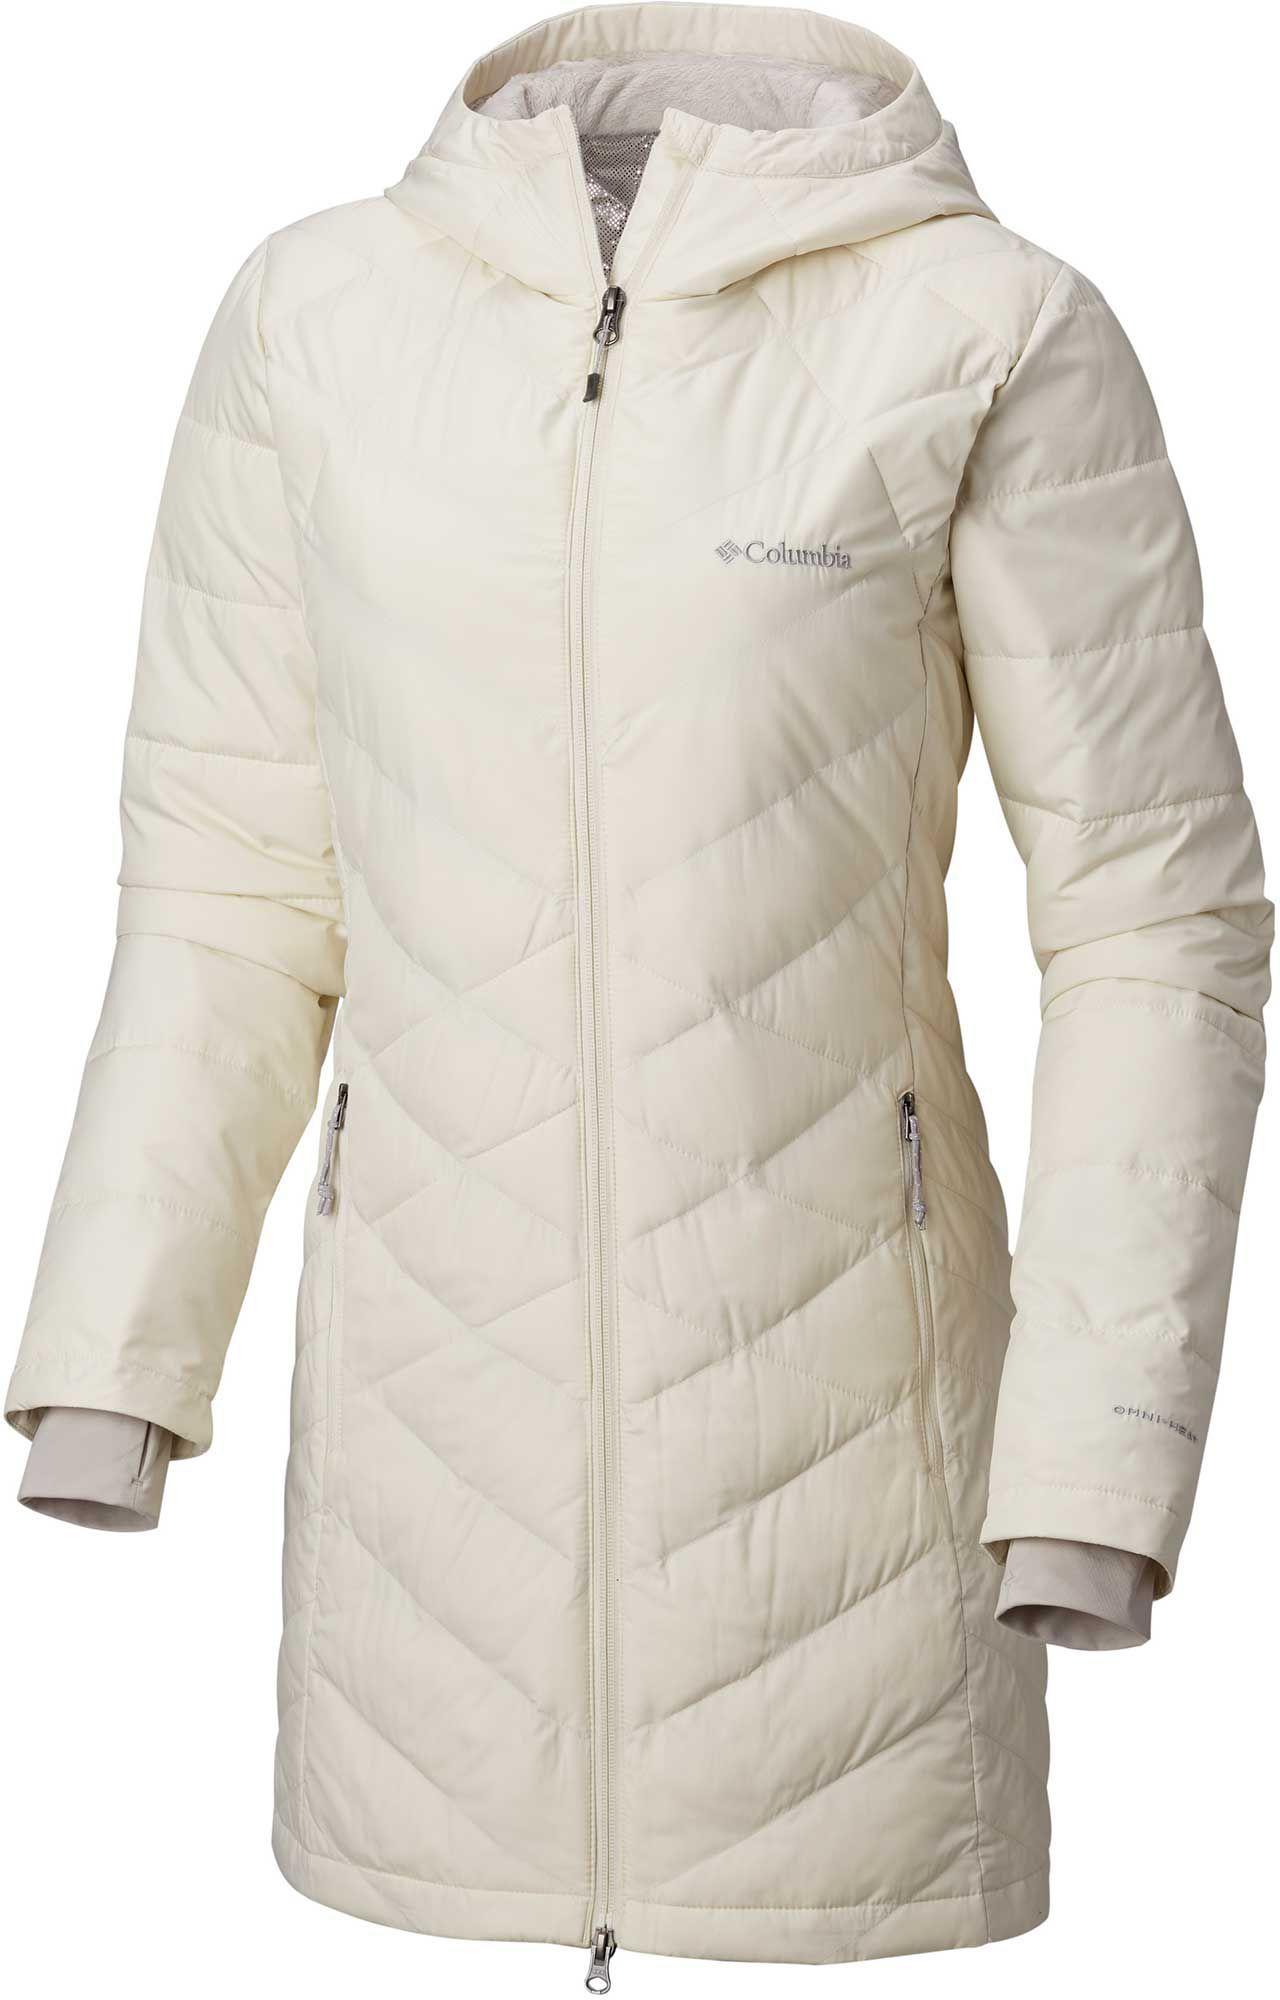 1f15bb3fc3f1 Columbia Women s Heavenly Long Hooded Jacket